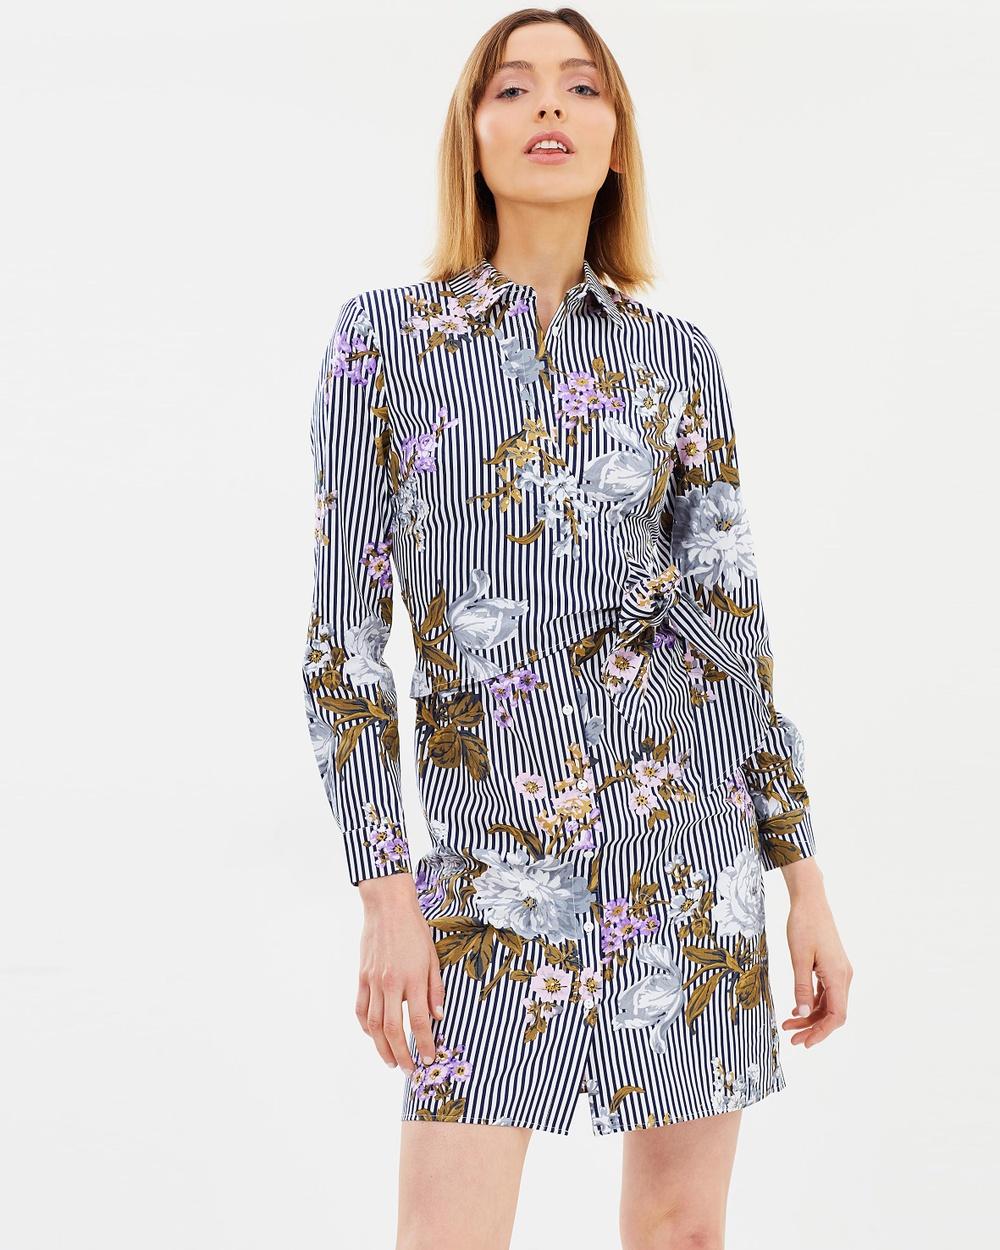 Warehouse Molly Floral Cotton Shirt Dress Printed Dresses Blue Molly Floral Cotton Shirt Dress